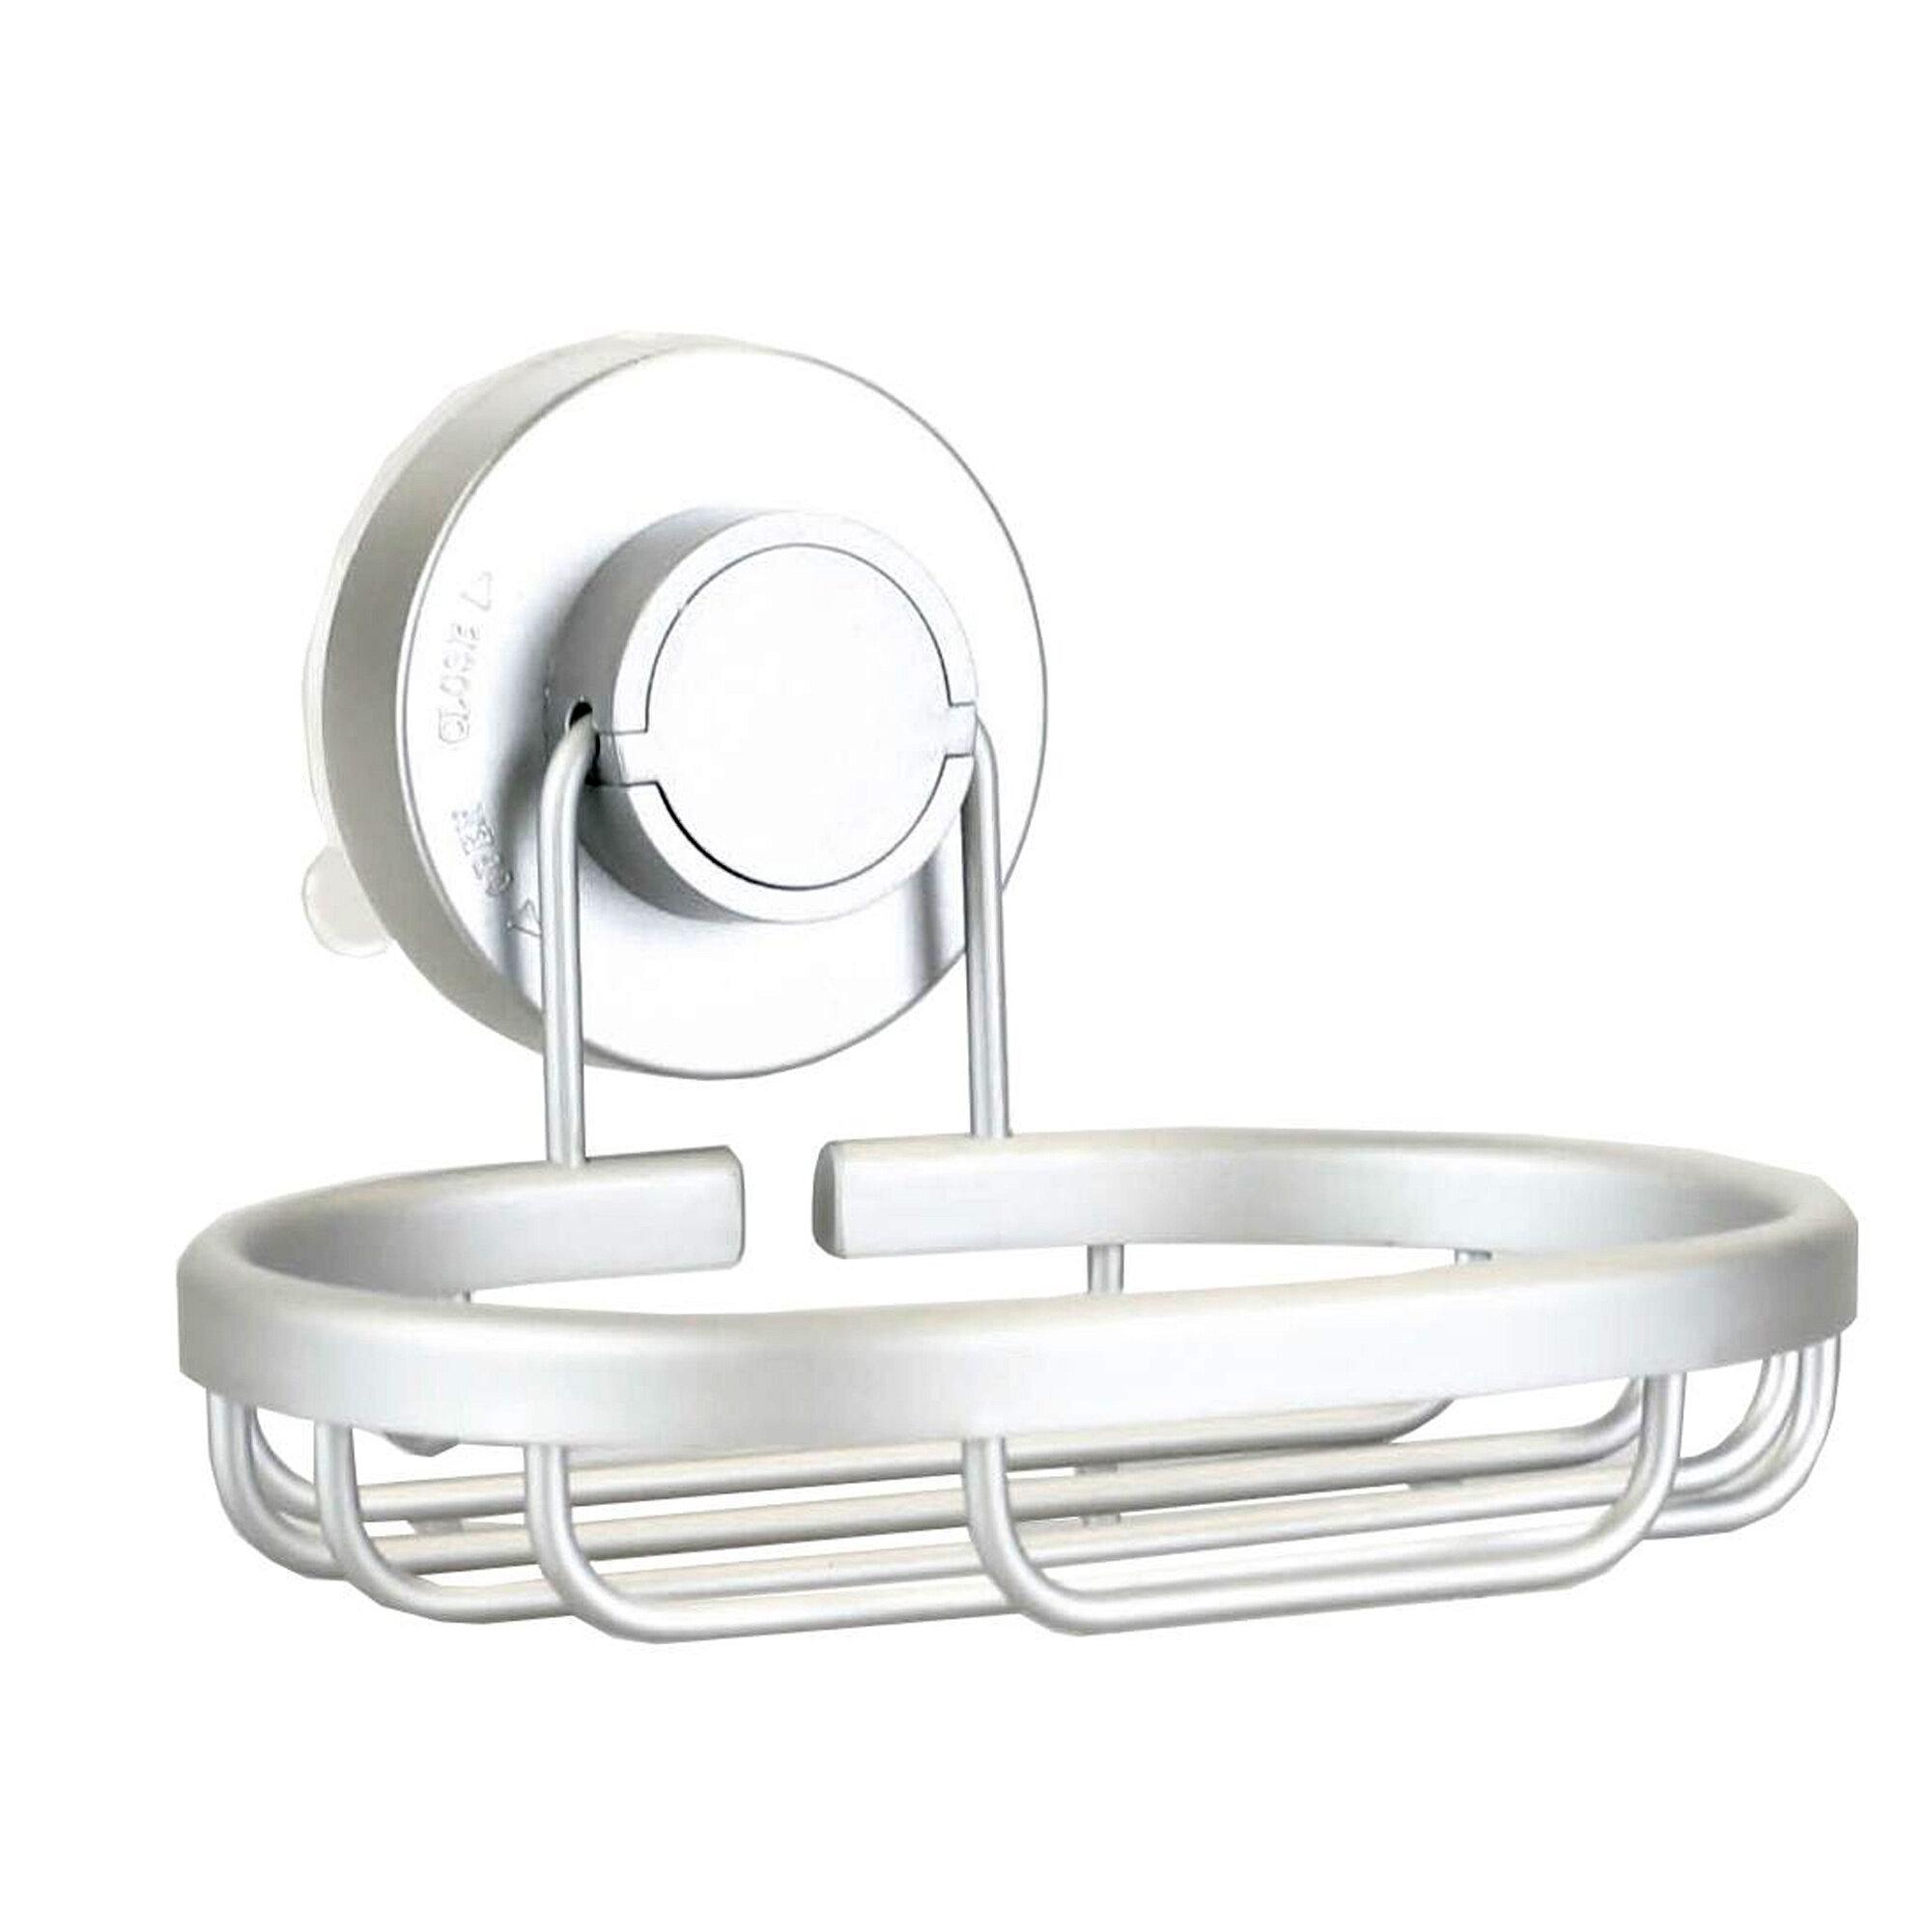 Rebrilliant Callicoat Twist N Lock Suction Cup Bathroom Soap Dish ...